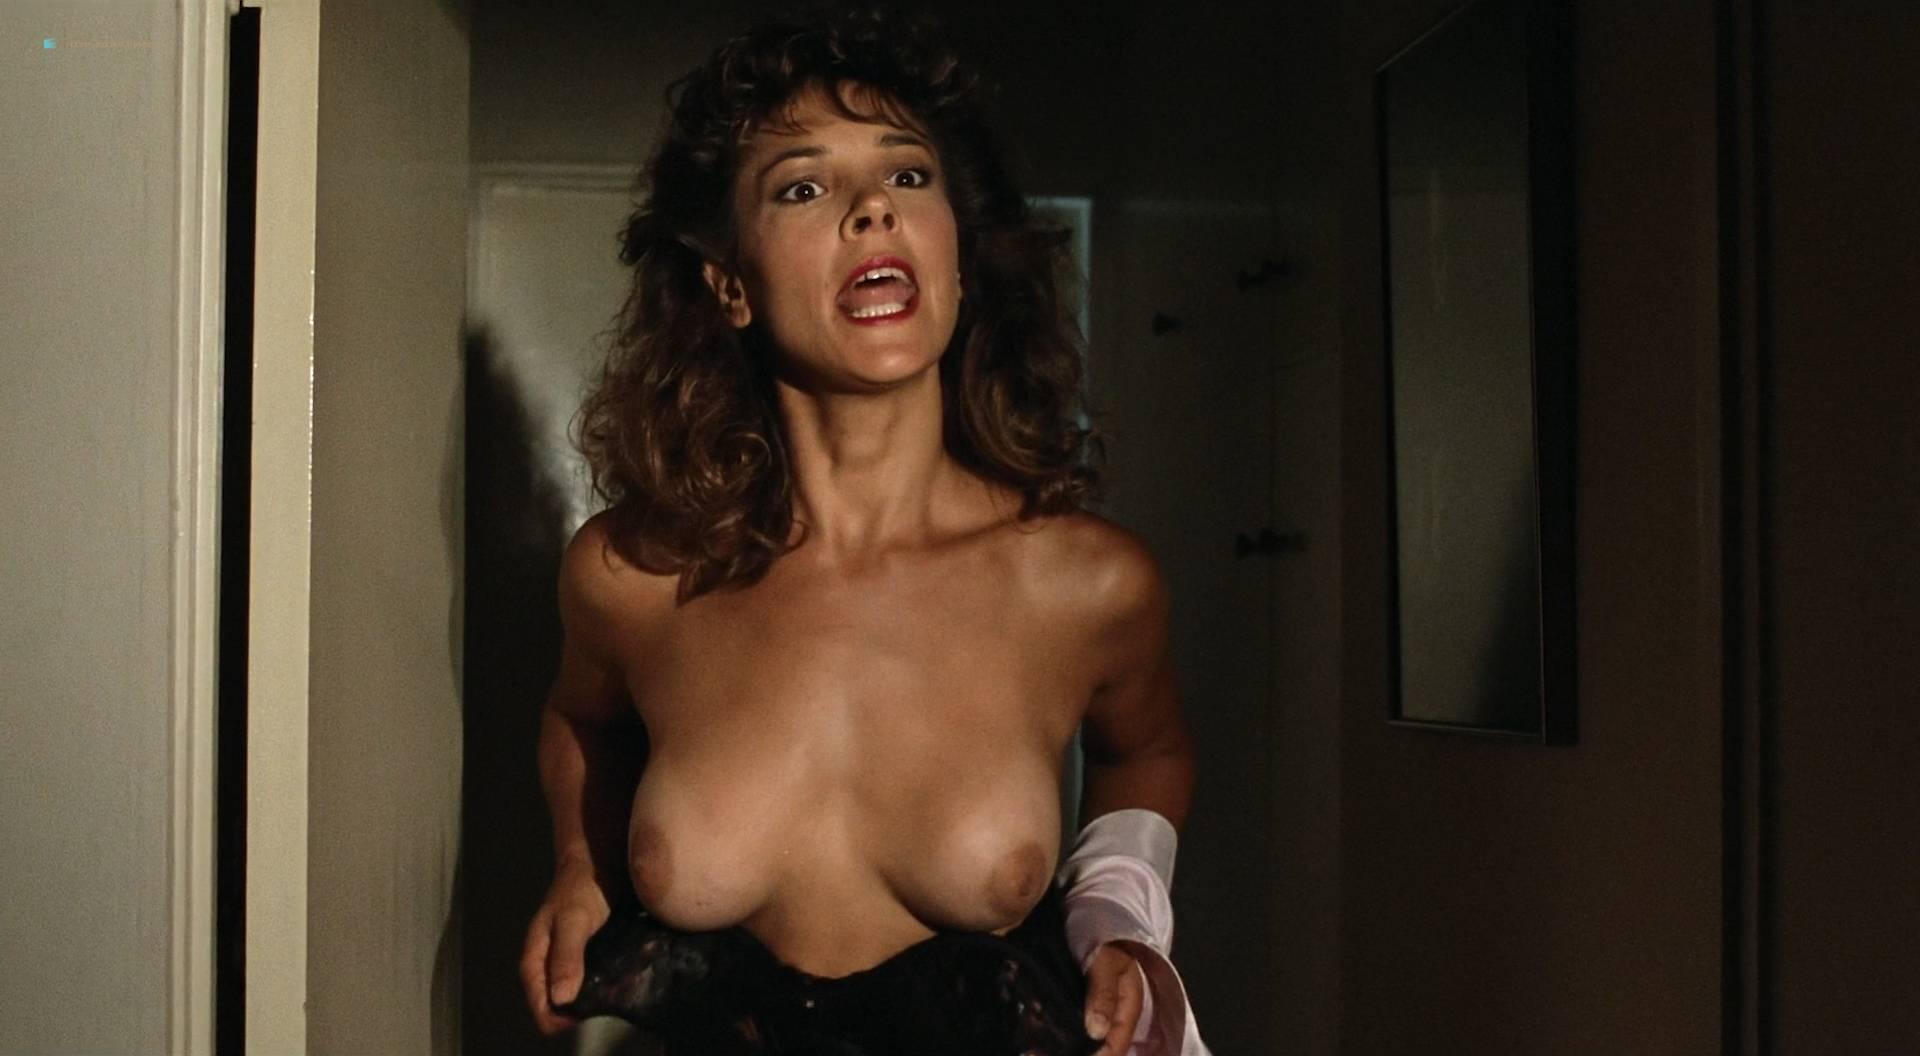 Monique gabrielle naked nude